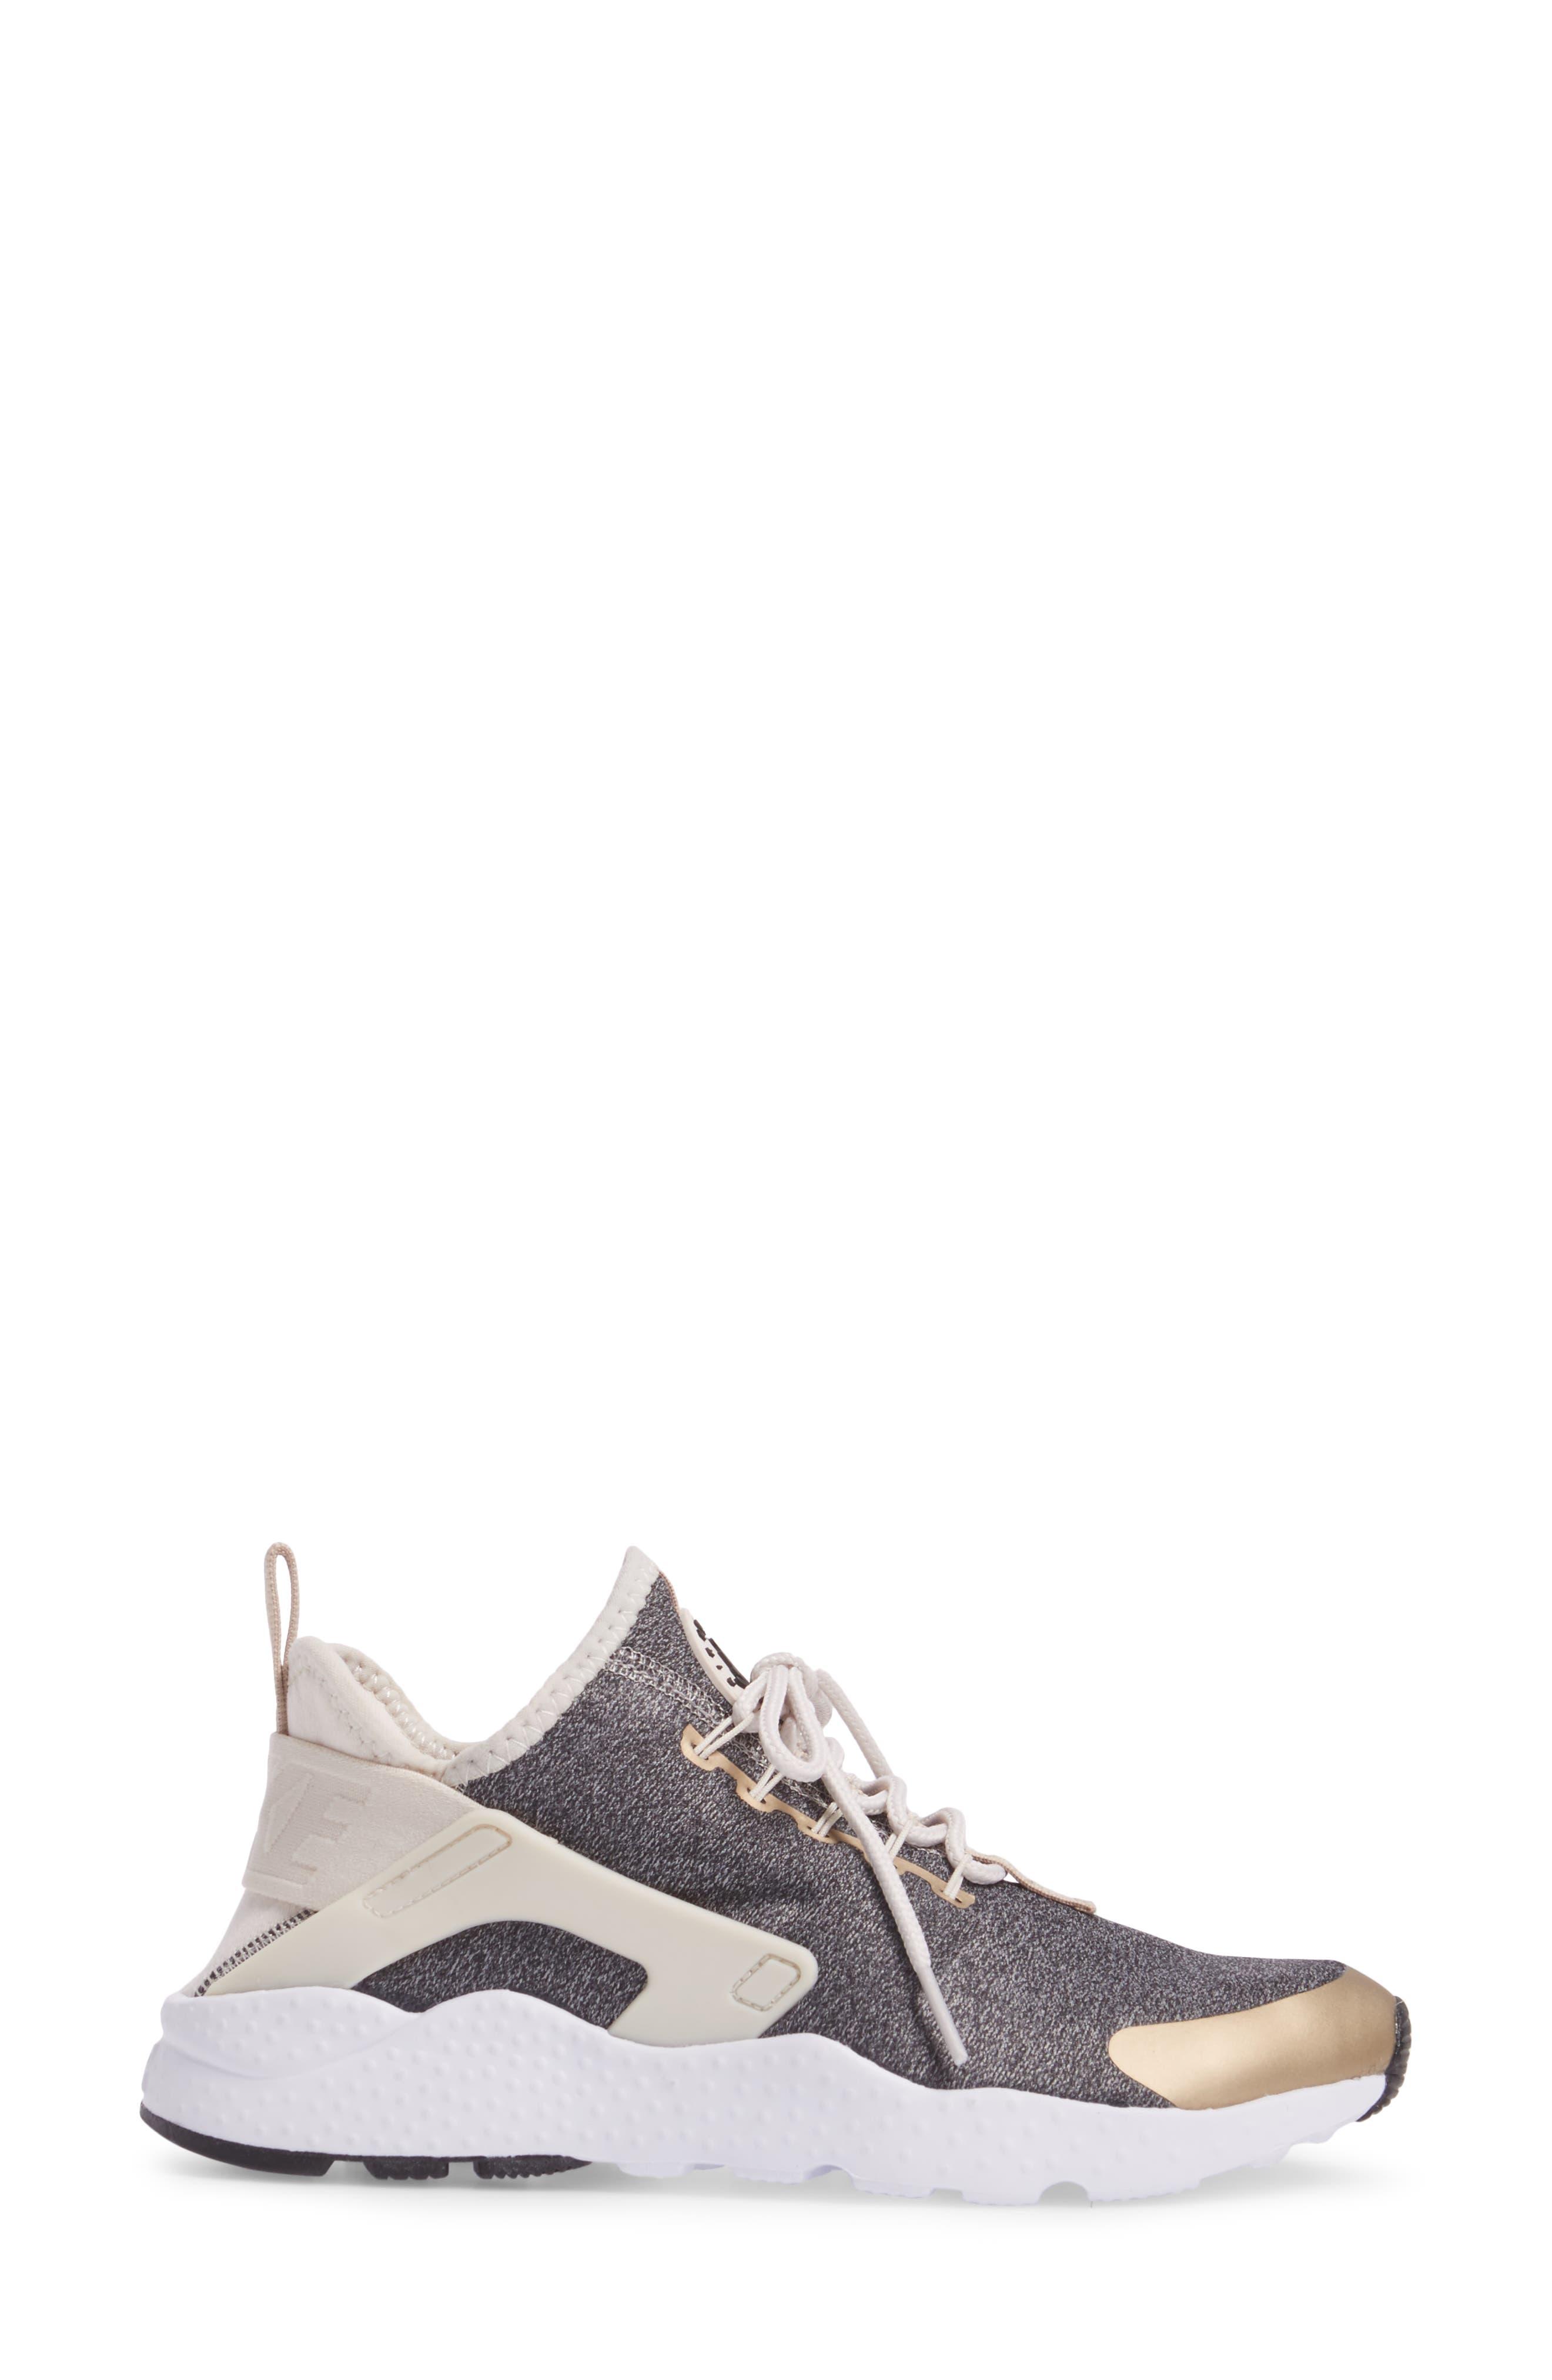 NIKE,                             'Air Huarache Run Ultra SE' Sneaker,                             Alternate thumbnail 3, color,                             285